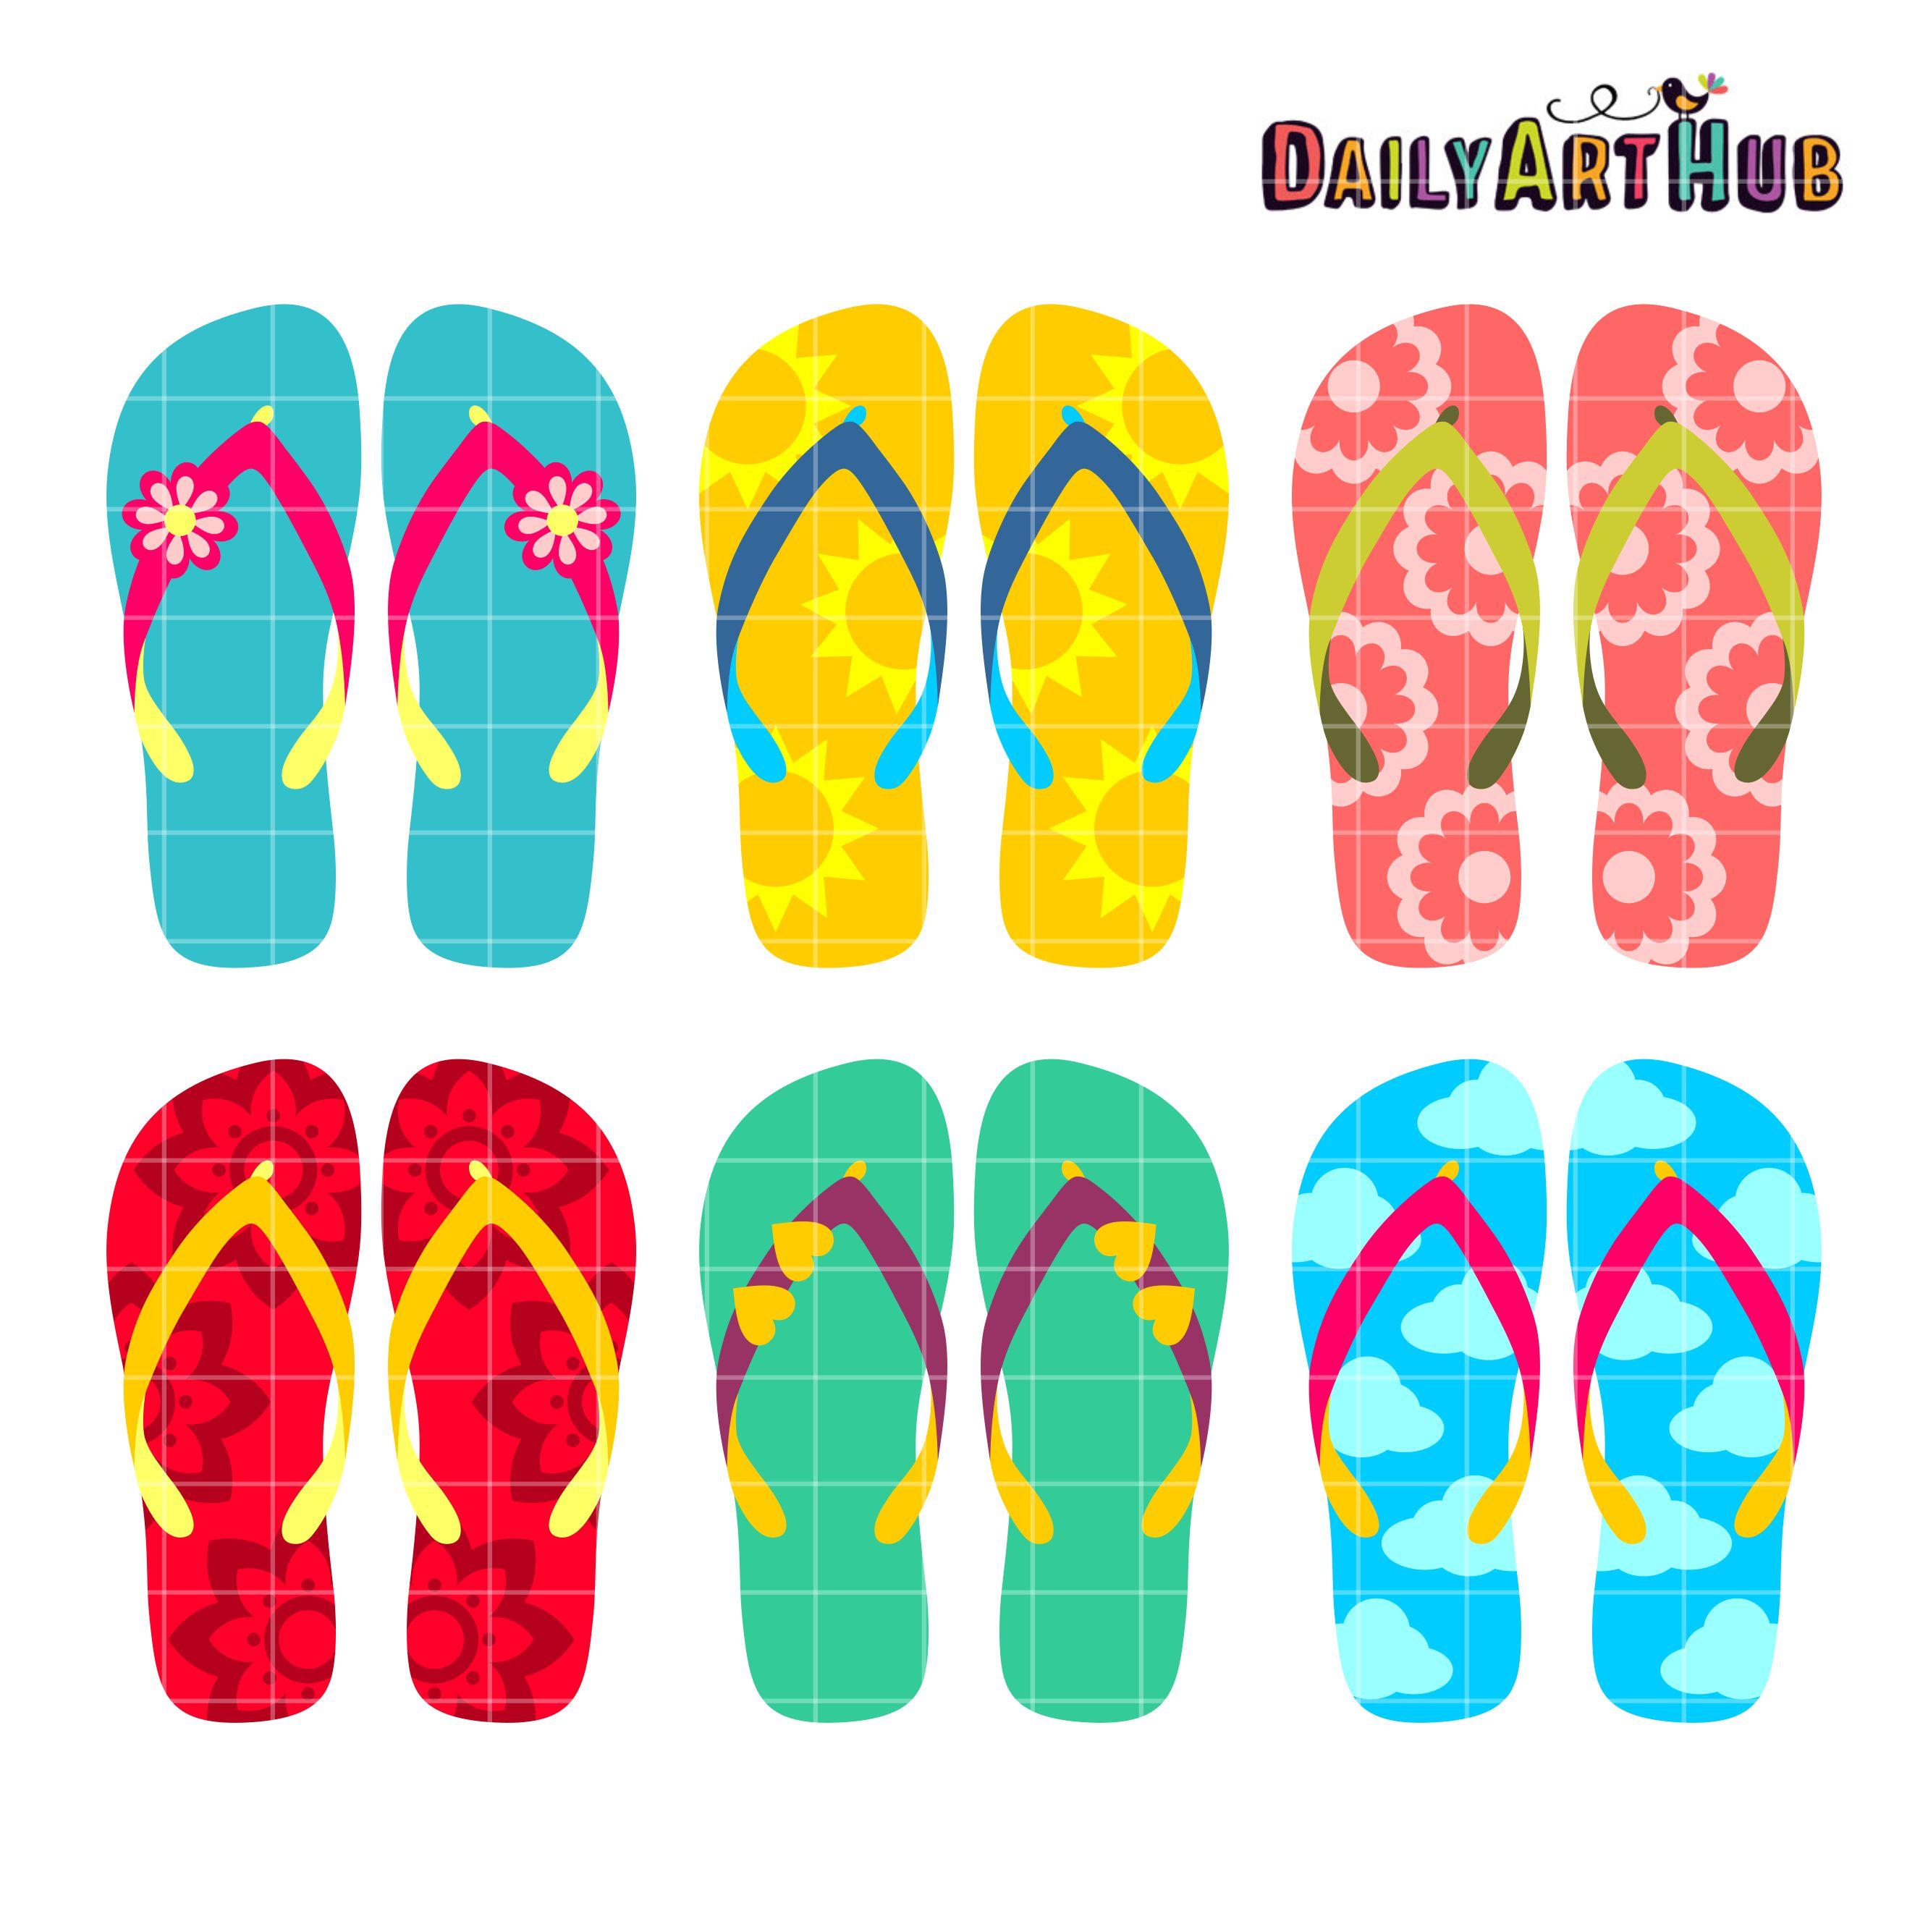 efed752bb5f6 Summer Flip Flops Clip Art Set – Daily Art Hub – Free Clip Art Everyday